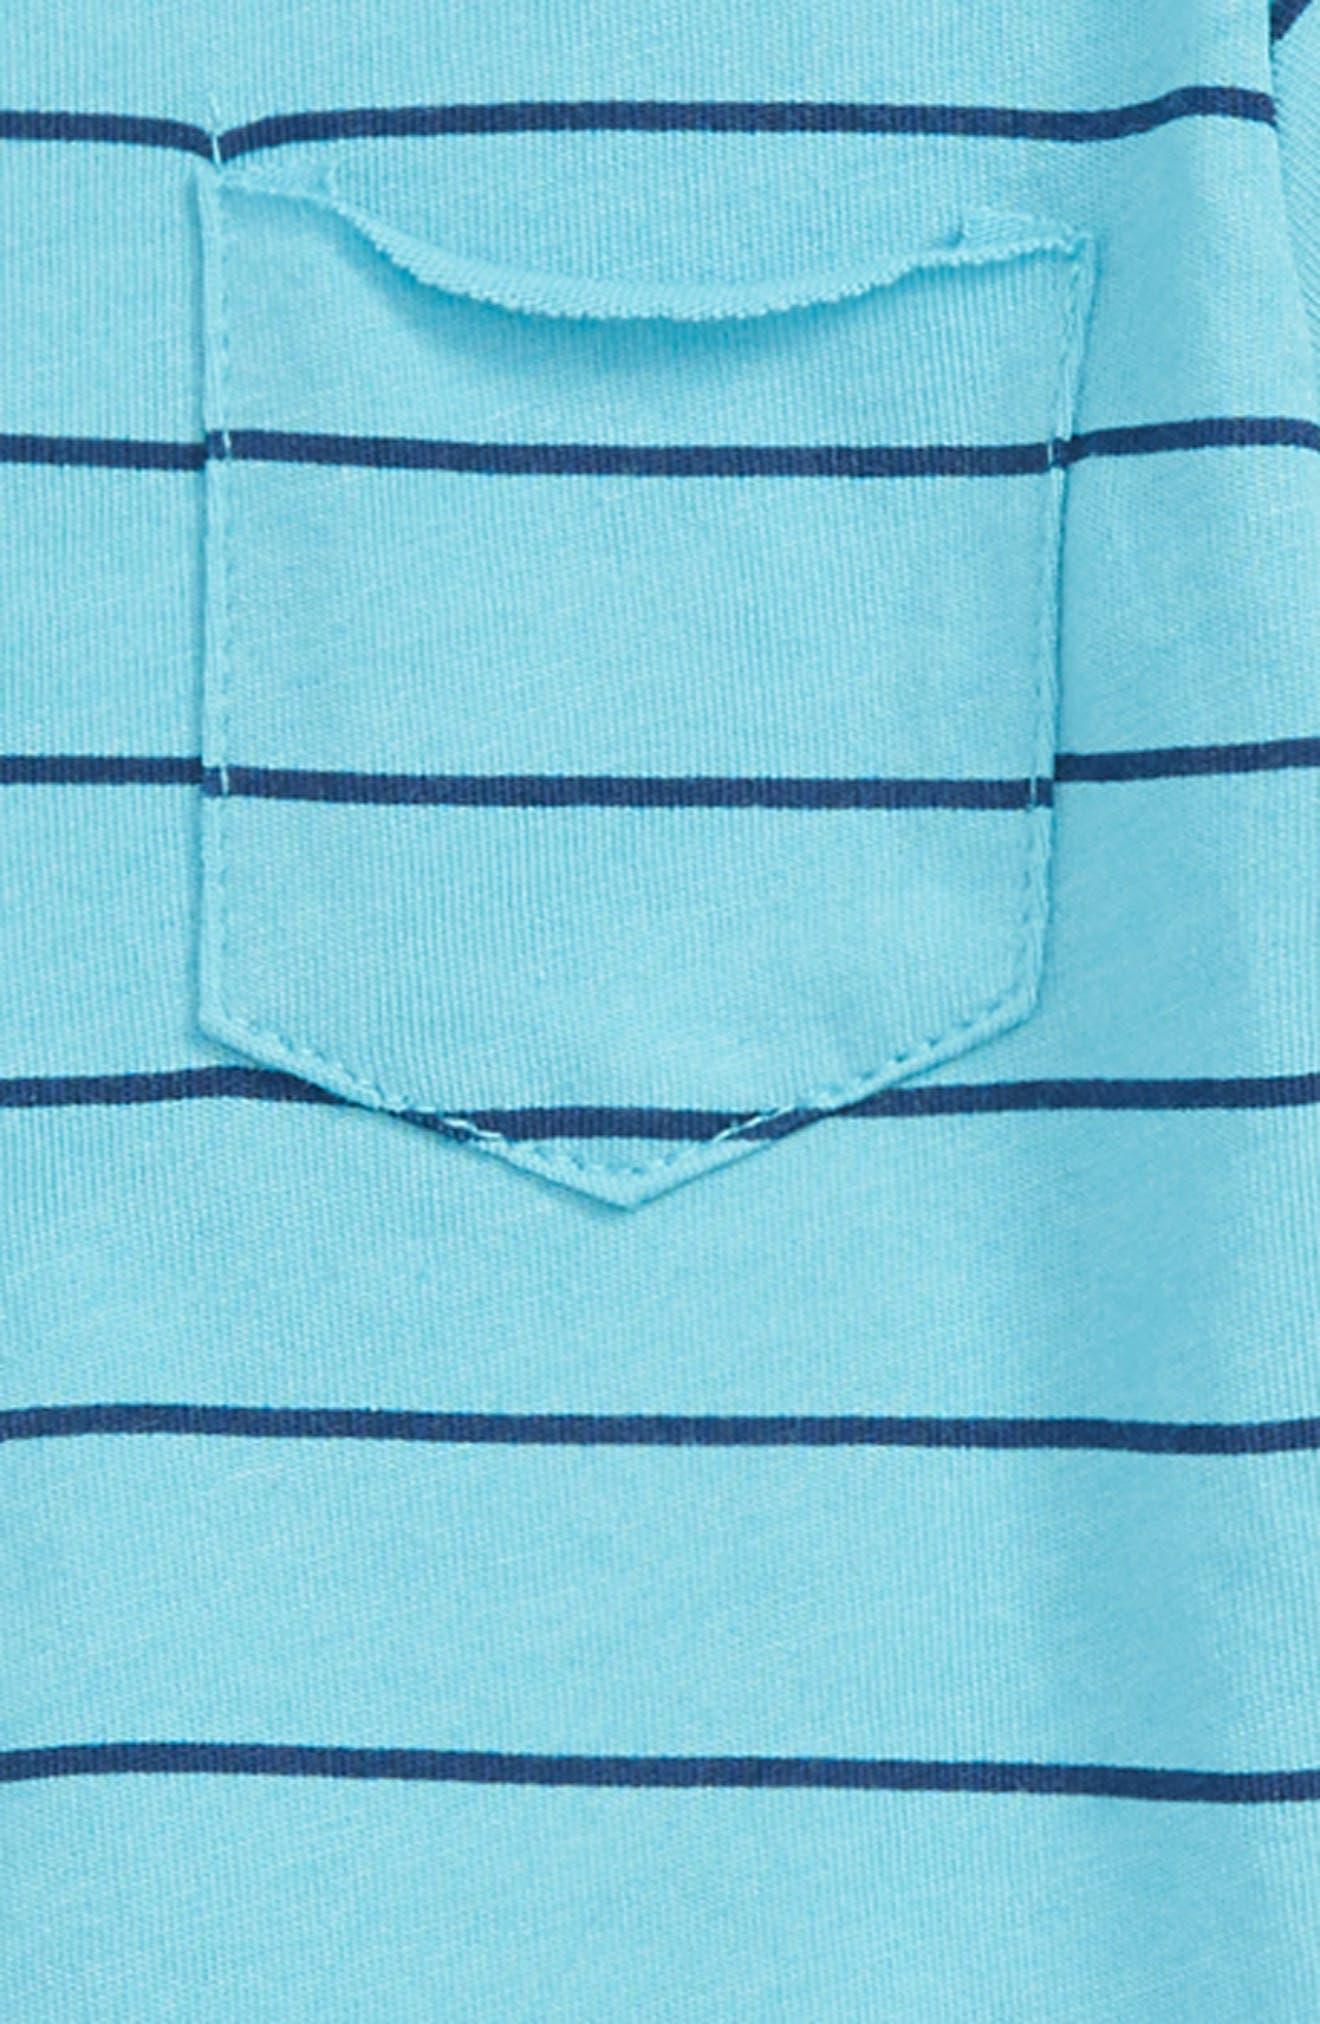 Henley T-Shirt & Shorts Set,                             Alternate thumbnail 2, color,                             400